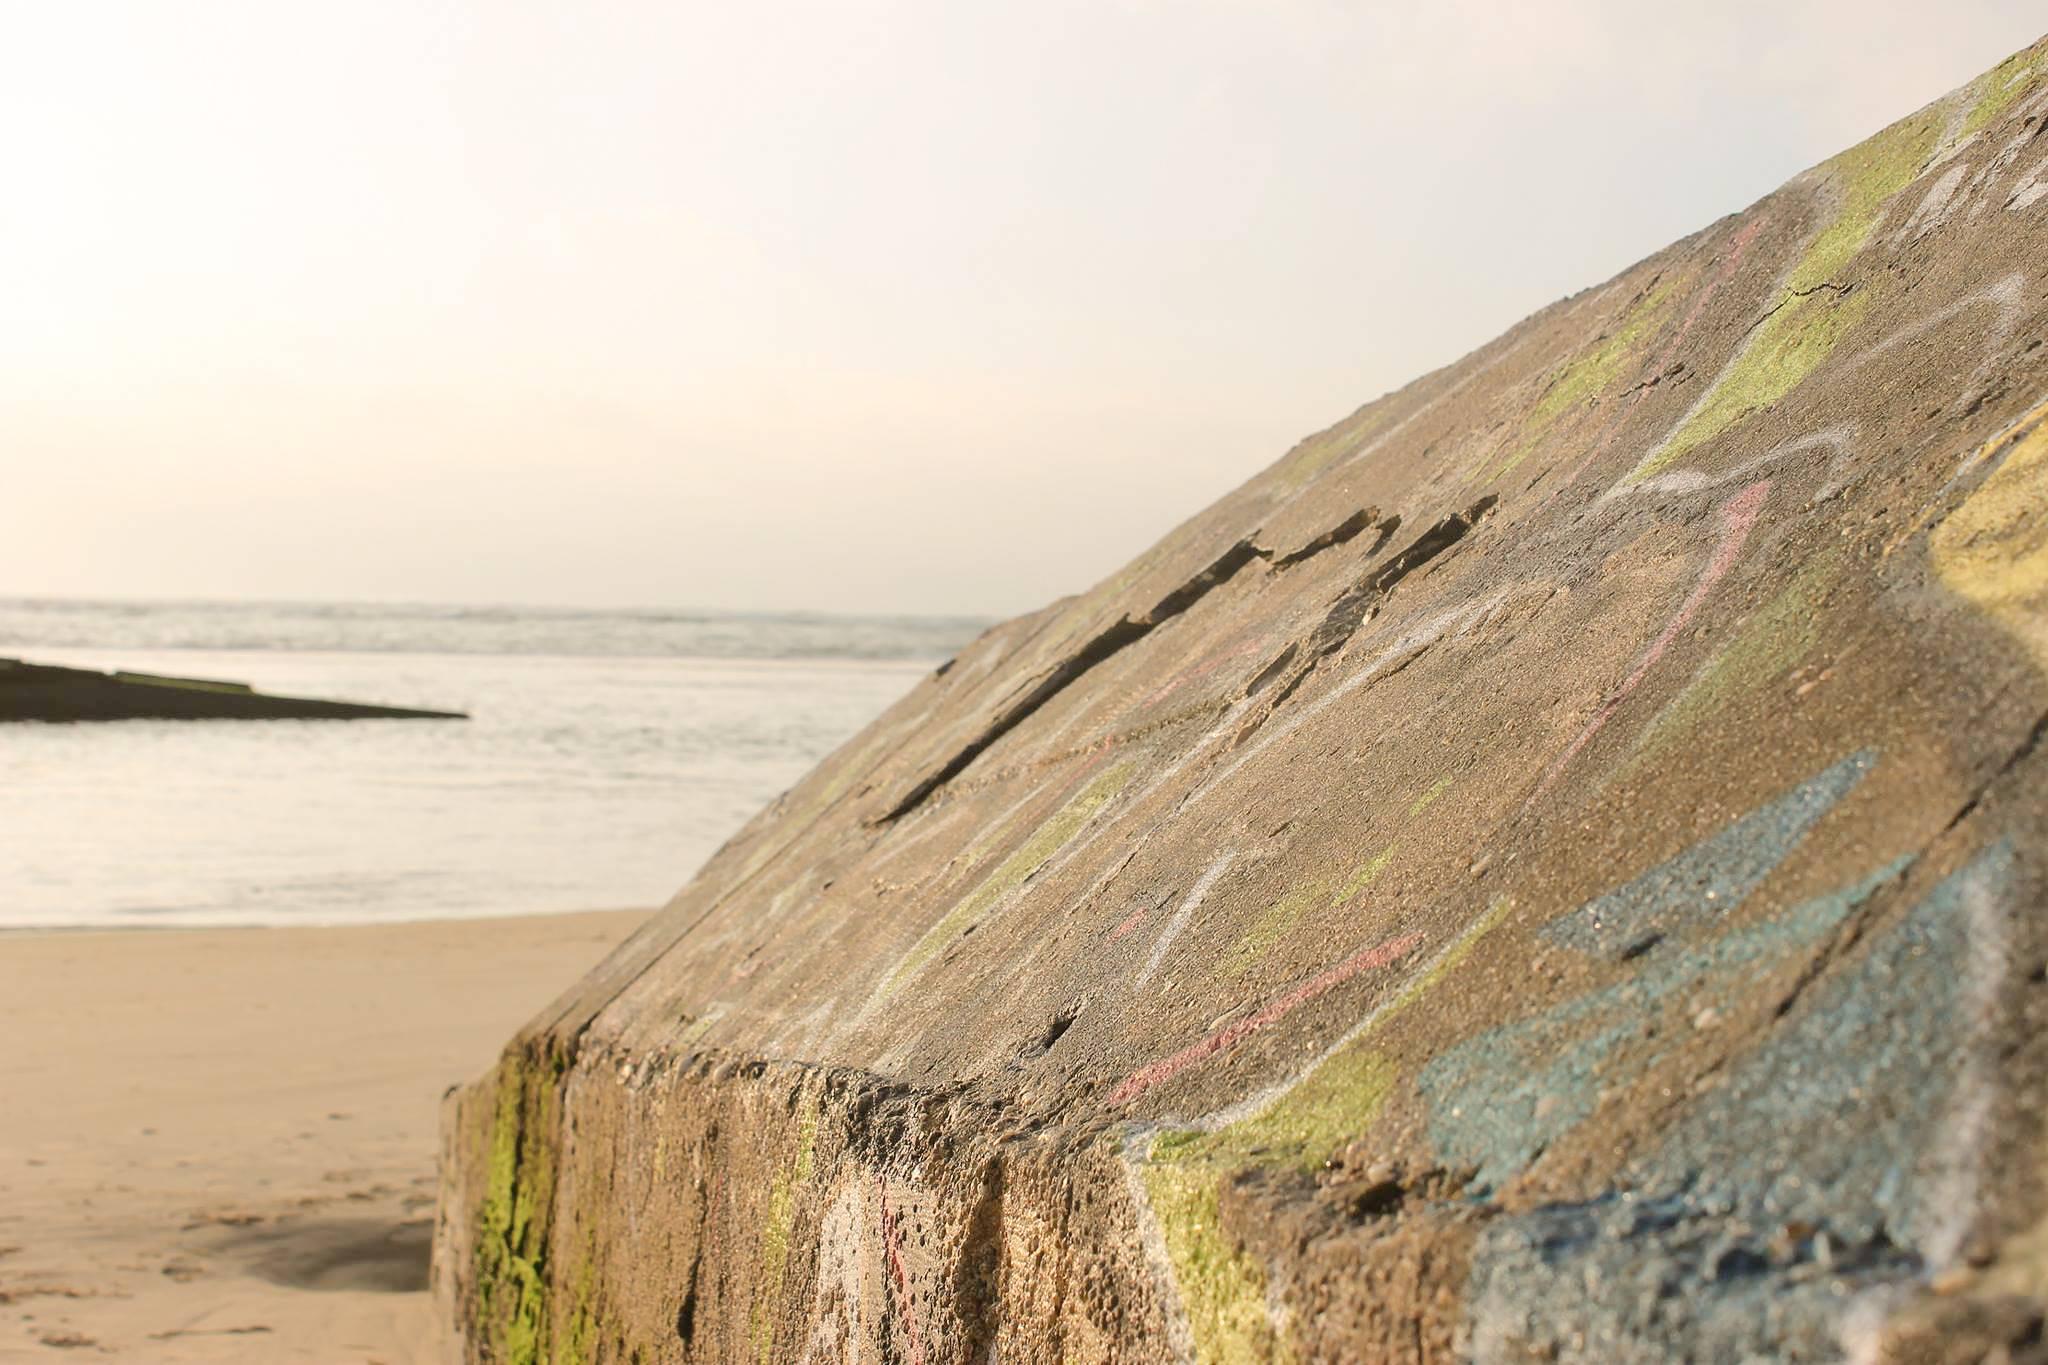 Photo 2: La Pointe - Balade inoubliable